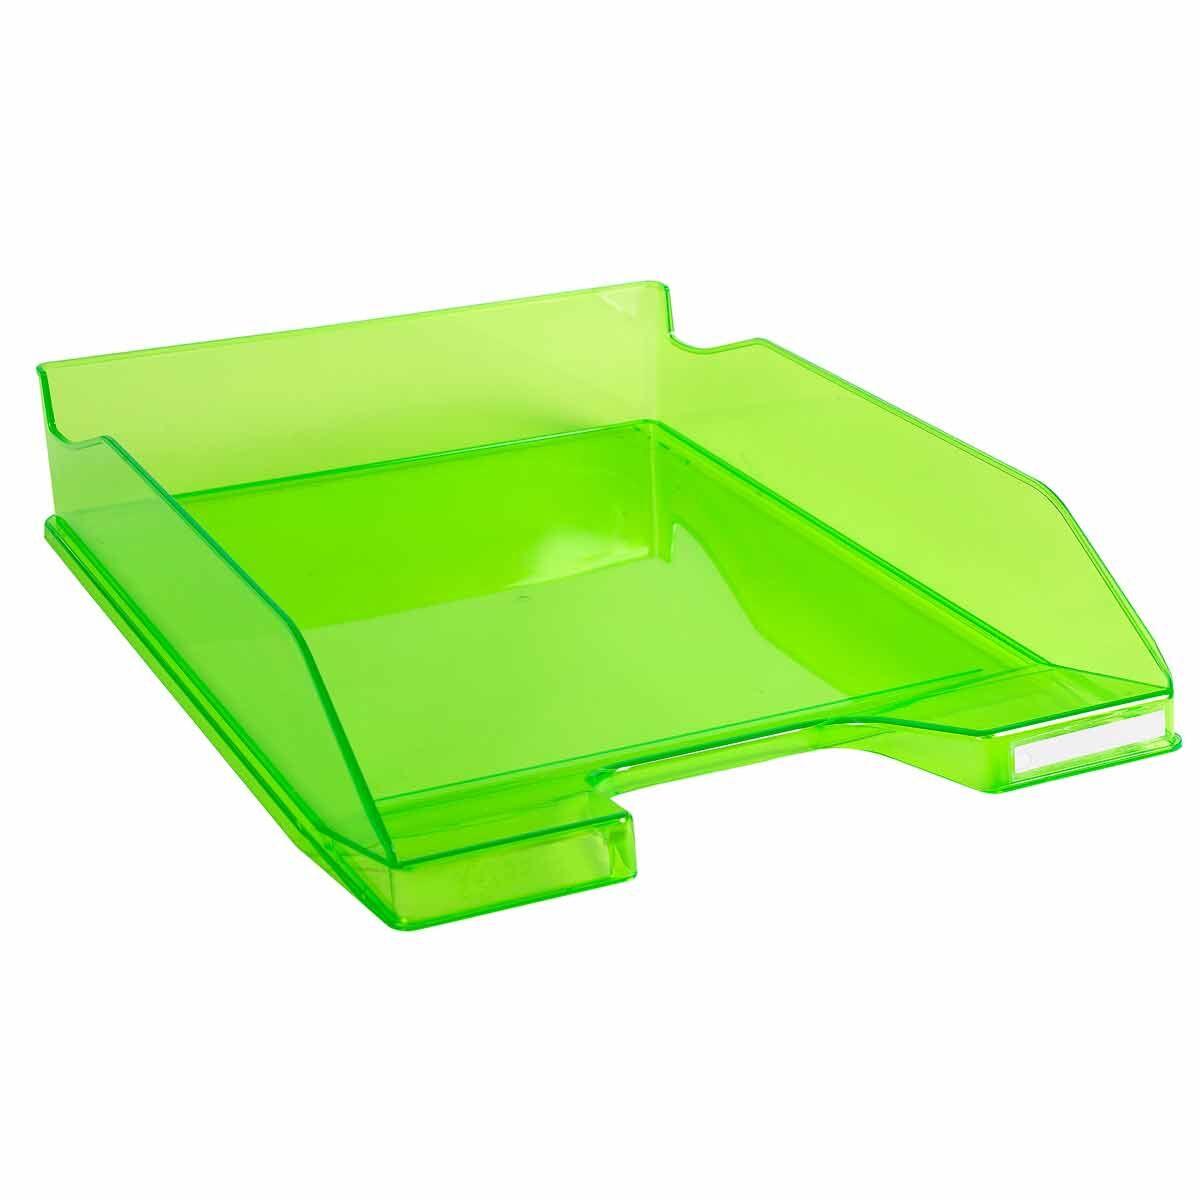 Exacompta Office Letter Tray Midi Combo Pack of 6 Translucent Gloss Green